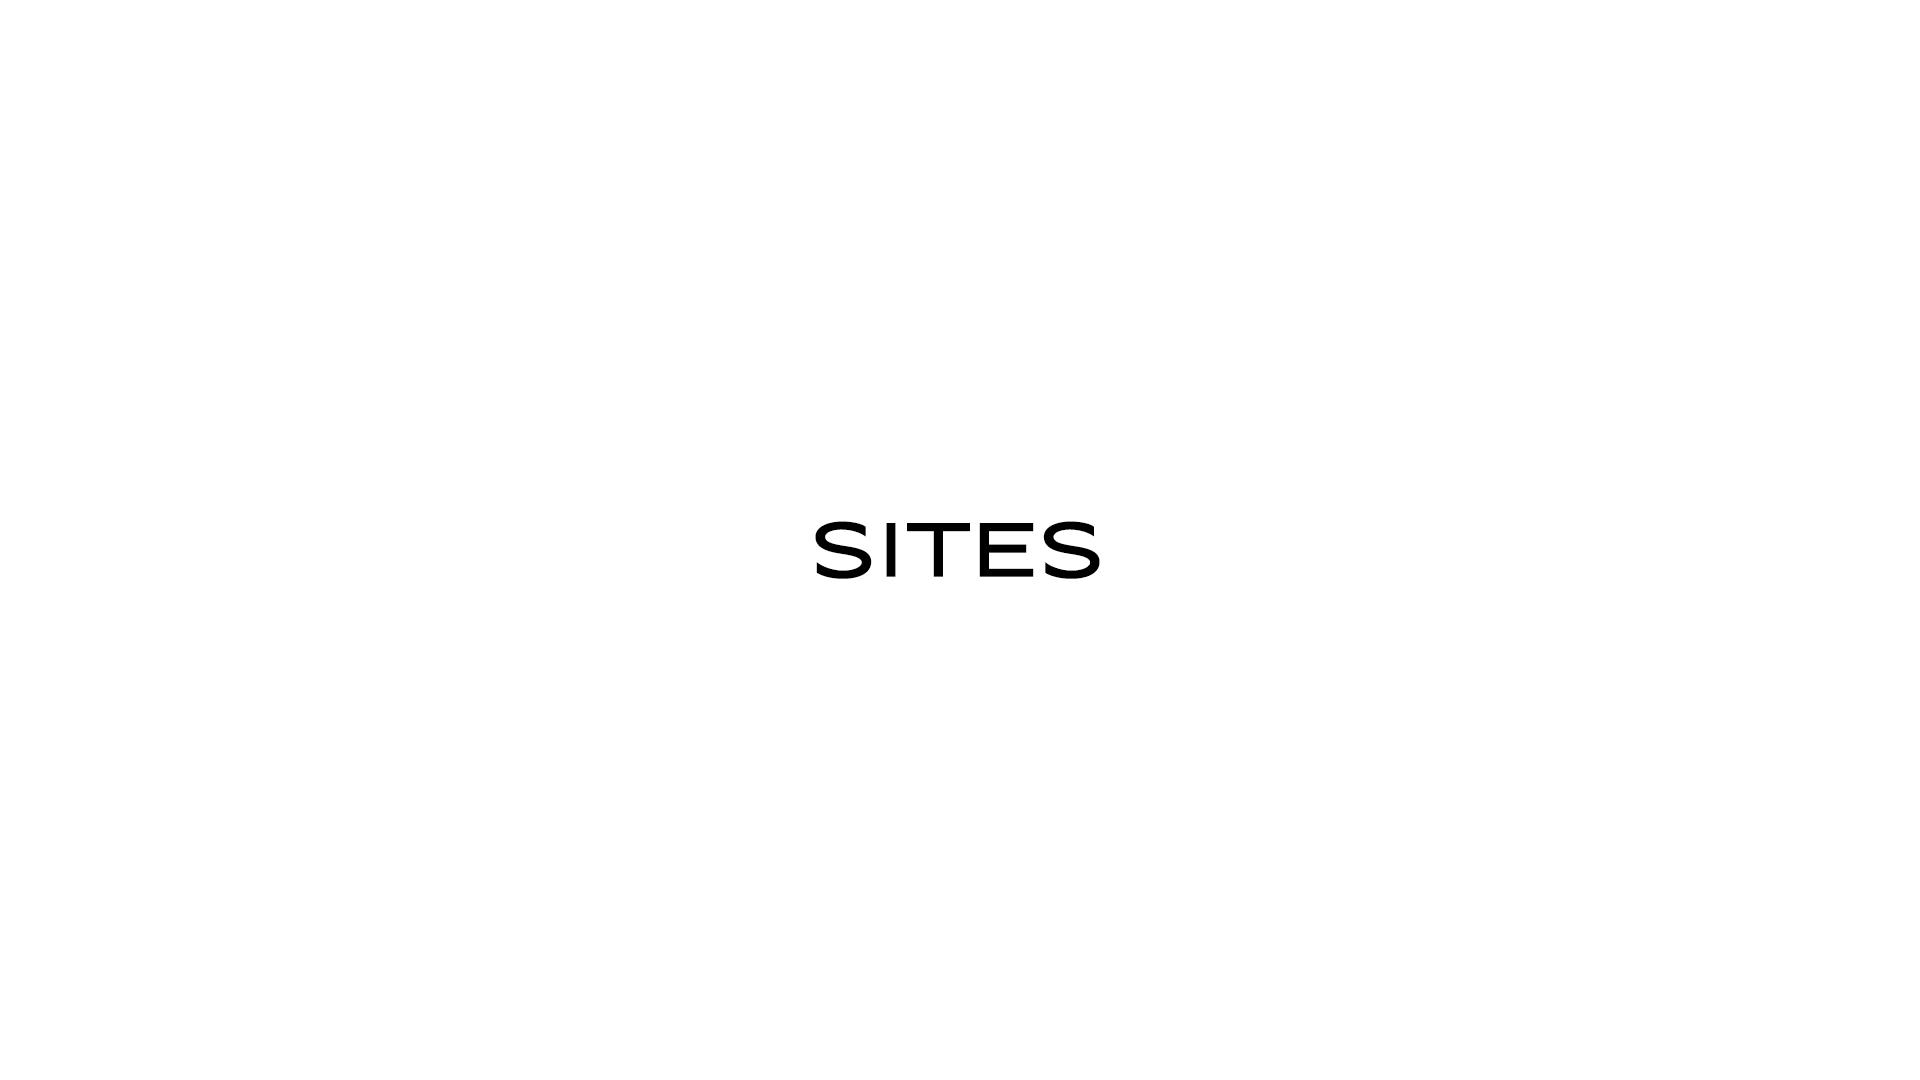 Capa trabalhos sites